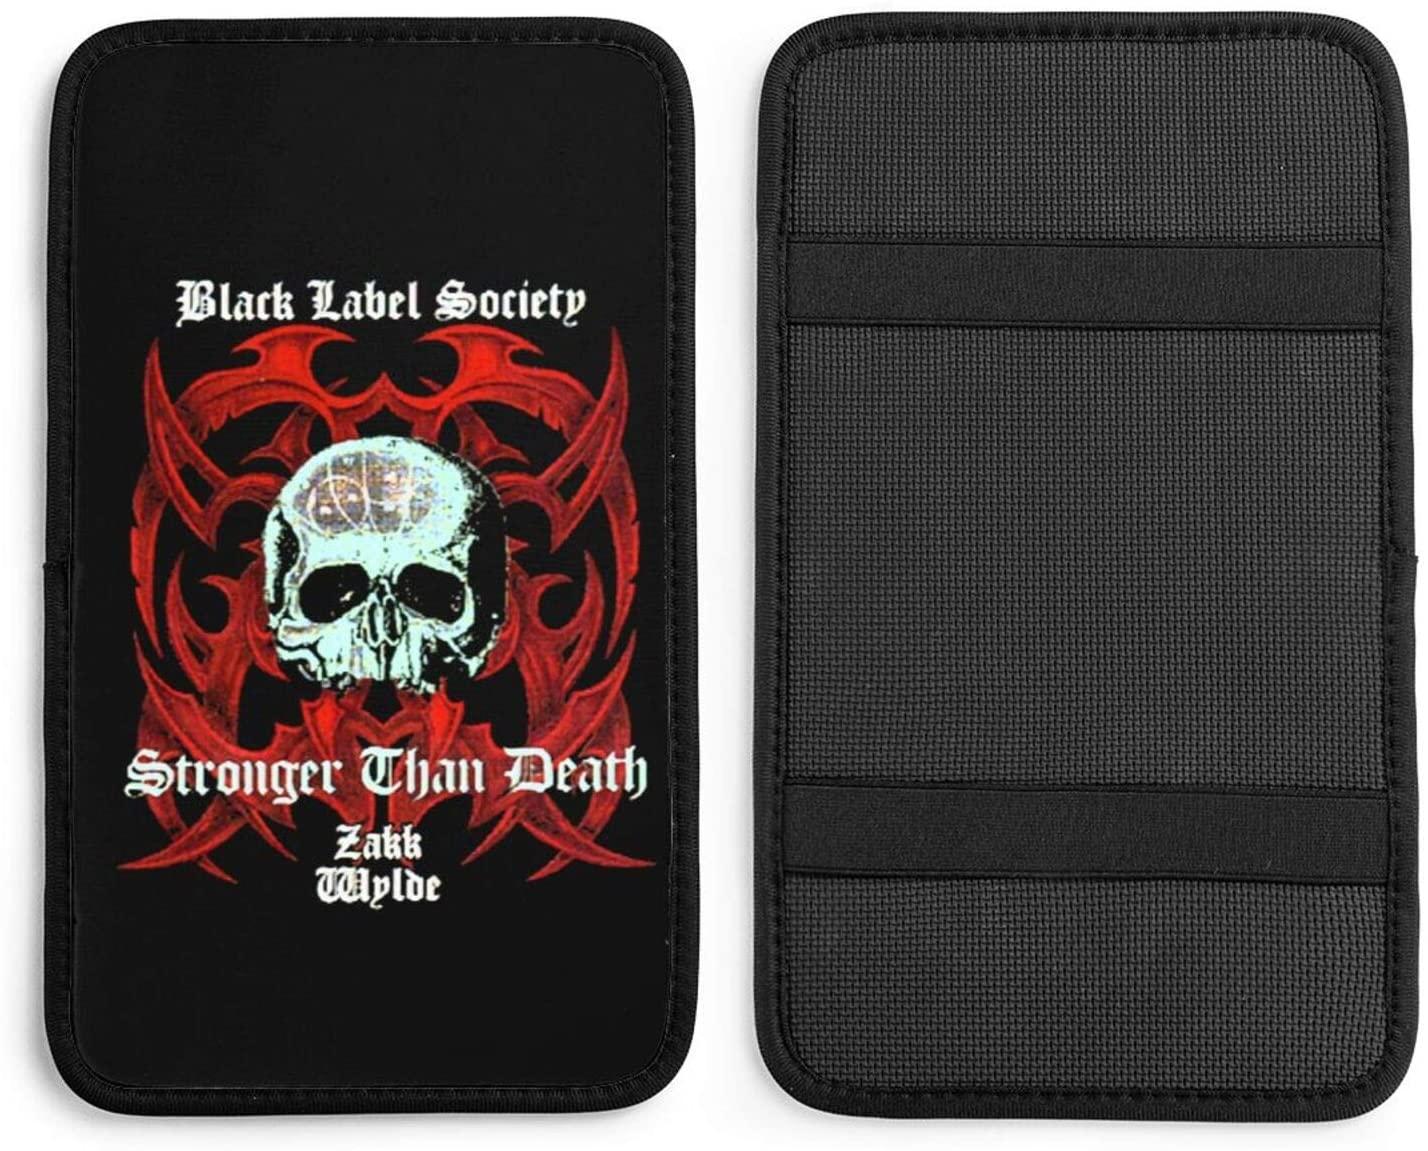 Opplsh Hdrejn Black Label Societycar Armrest Seat Box Cover Protective Cover Universal Decorative Cushion Auto Parts